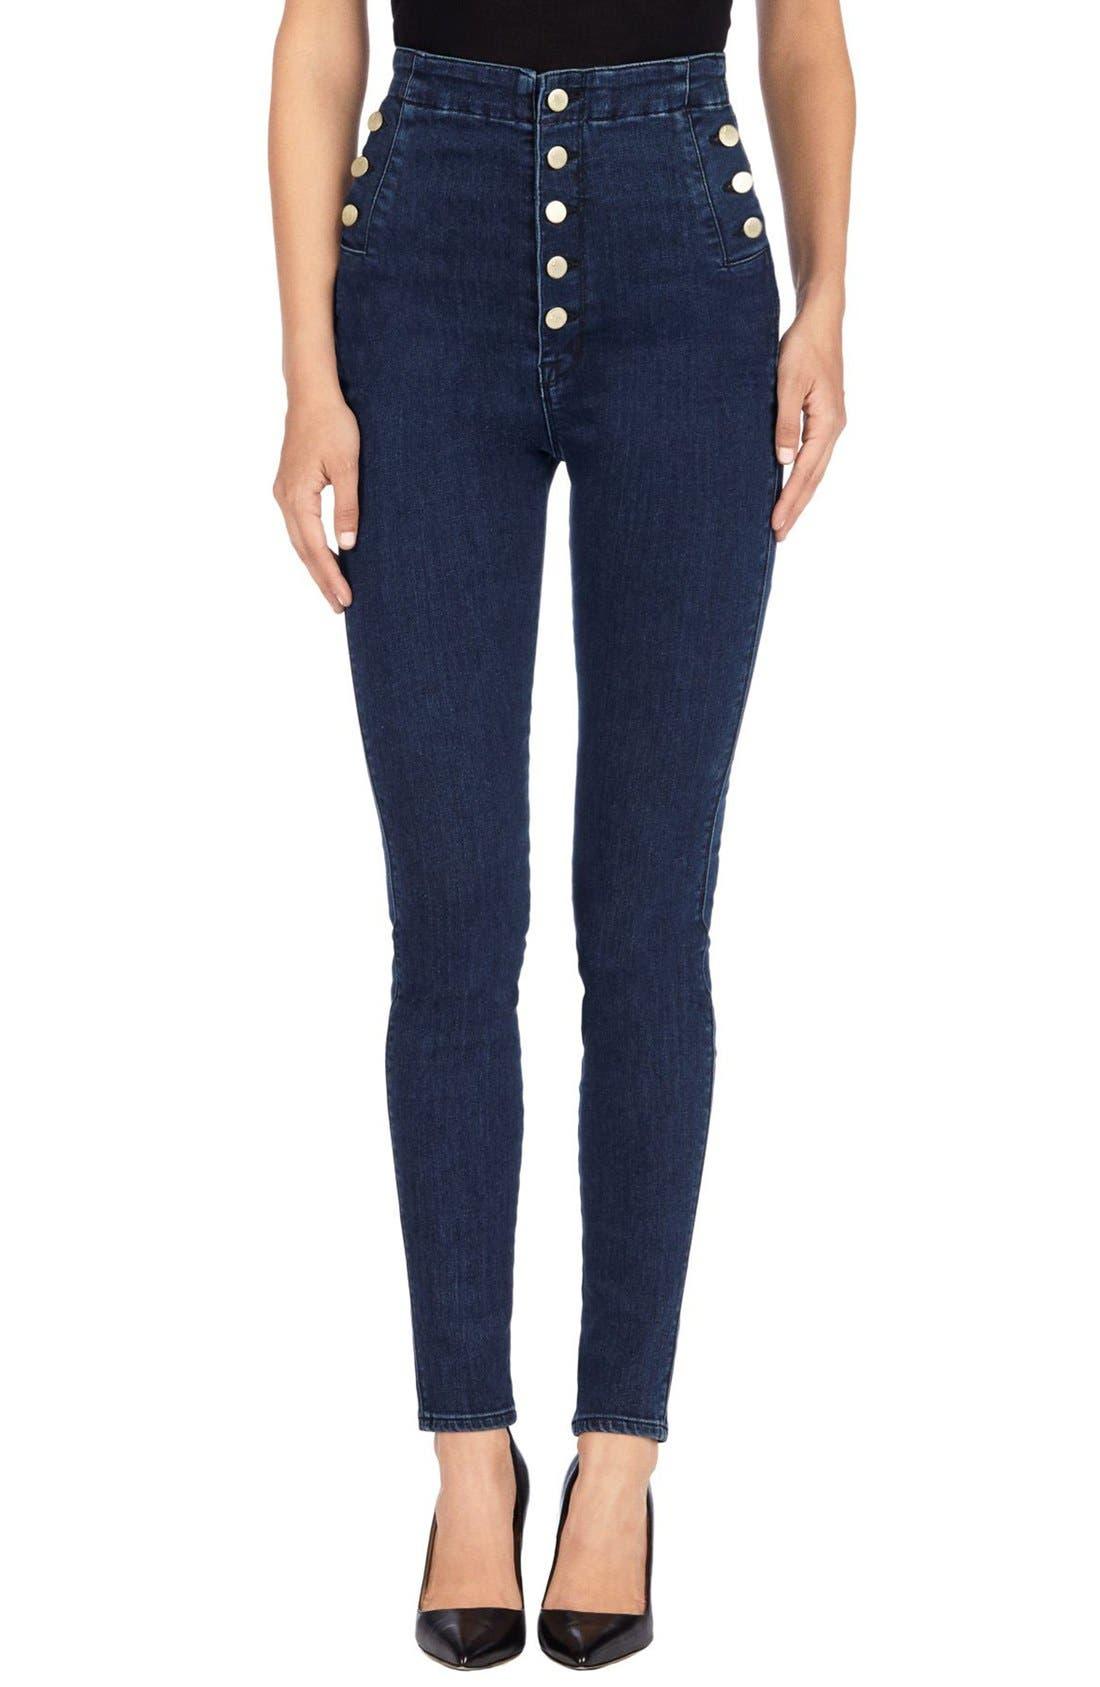 Alternate Image 1 Selected - J Brand 'Natasha Sky High' High Rise Skinny Jeans (Allegiance)